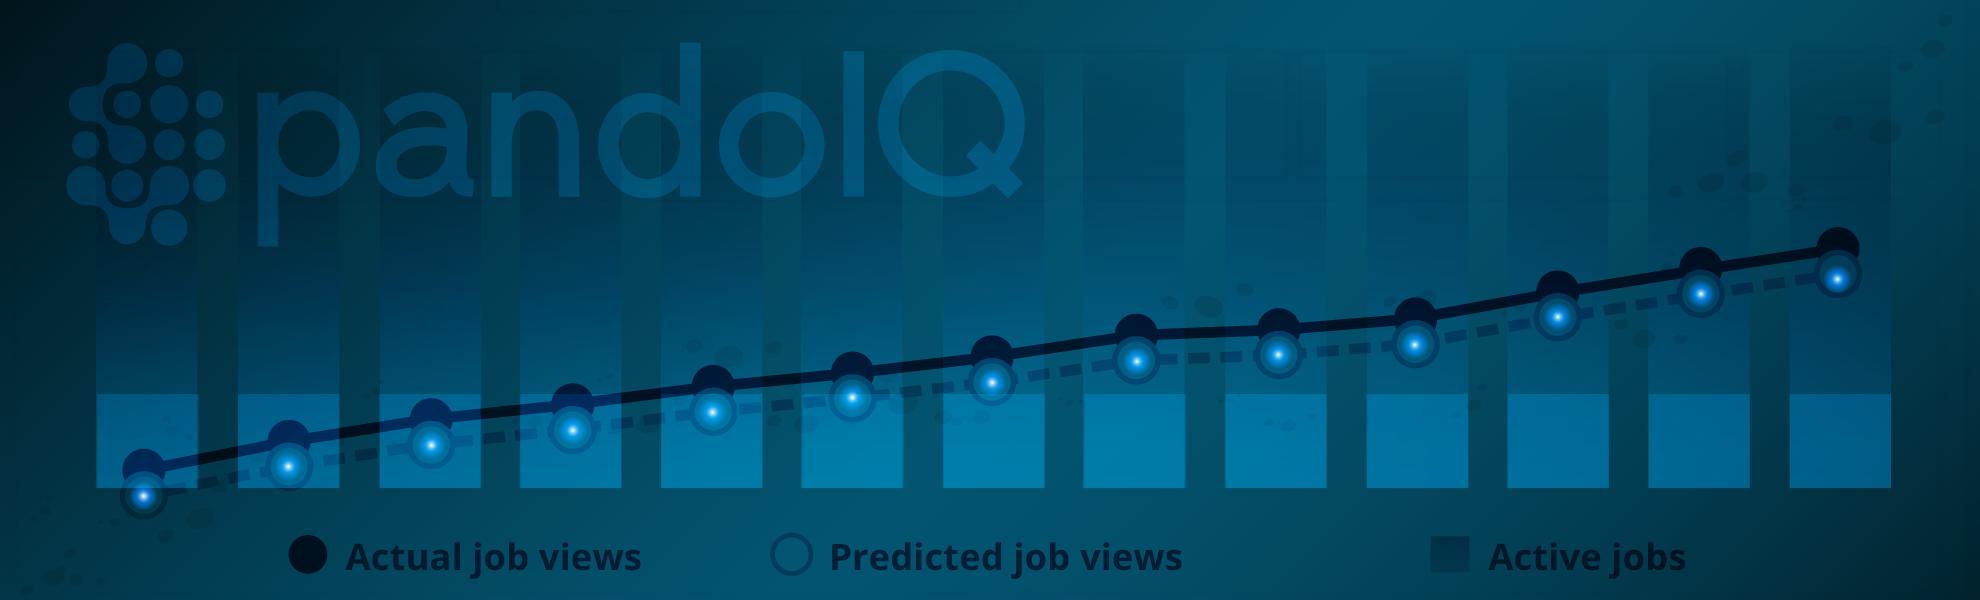 Predictive-Analytics Portal for pandoIQ September 13, 2018